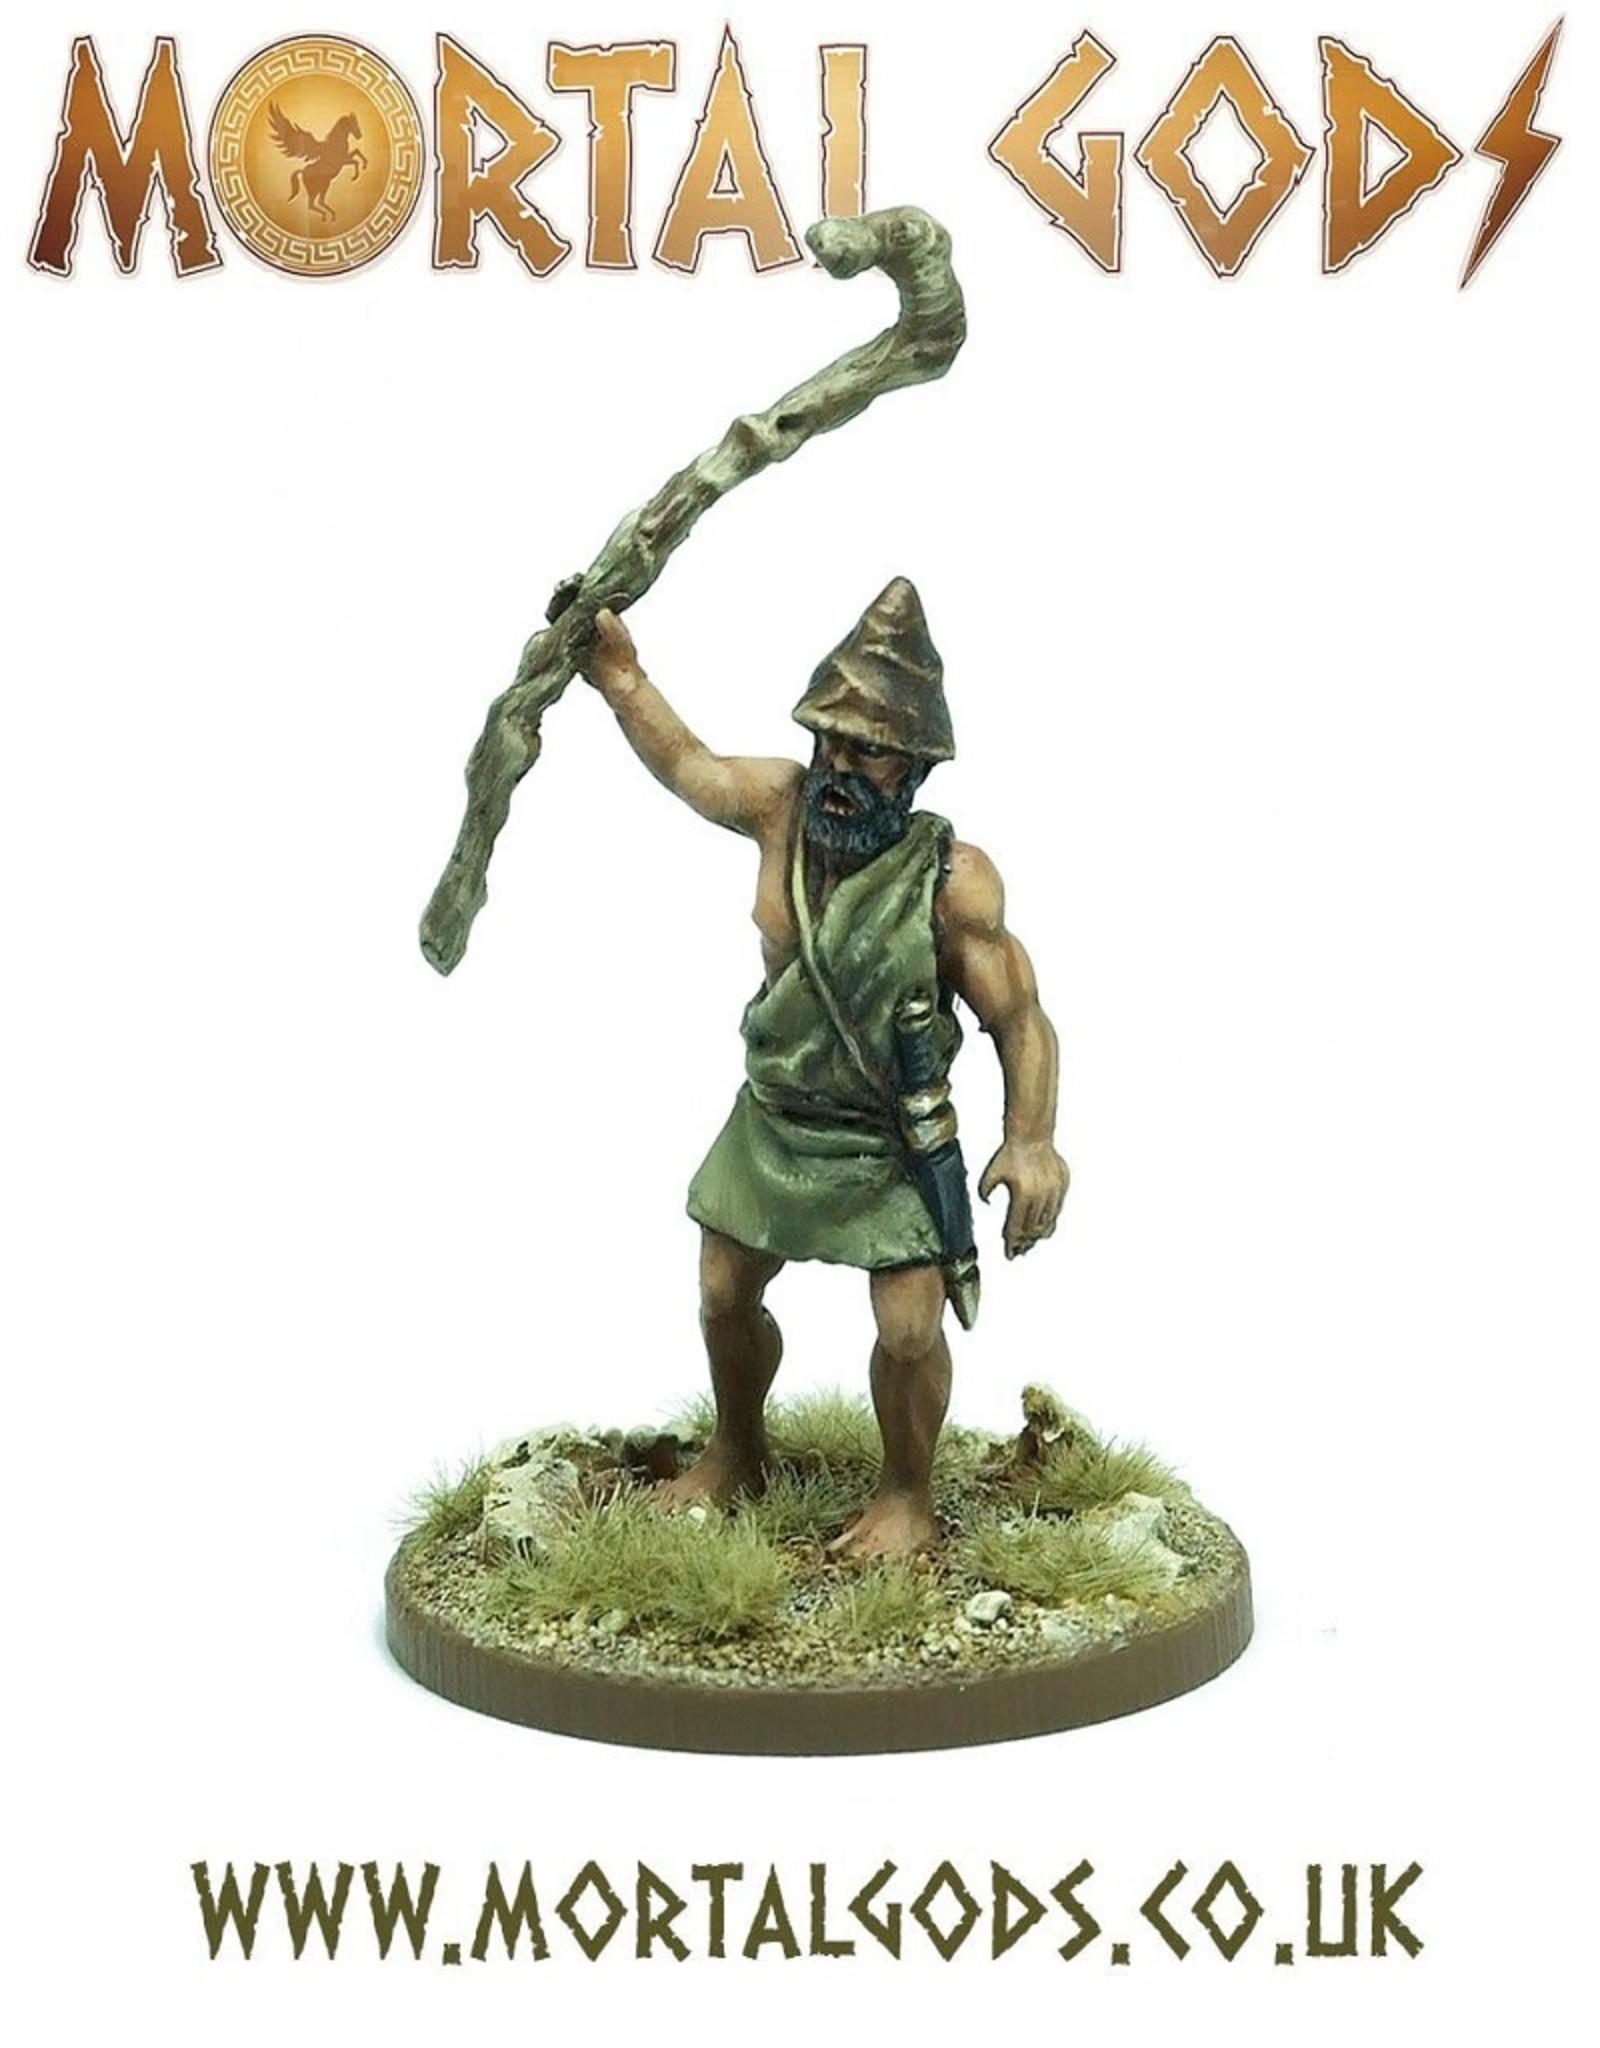 Footsore Mortal Gods - Seer